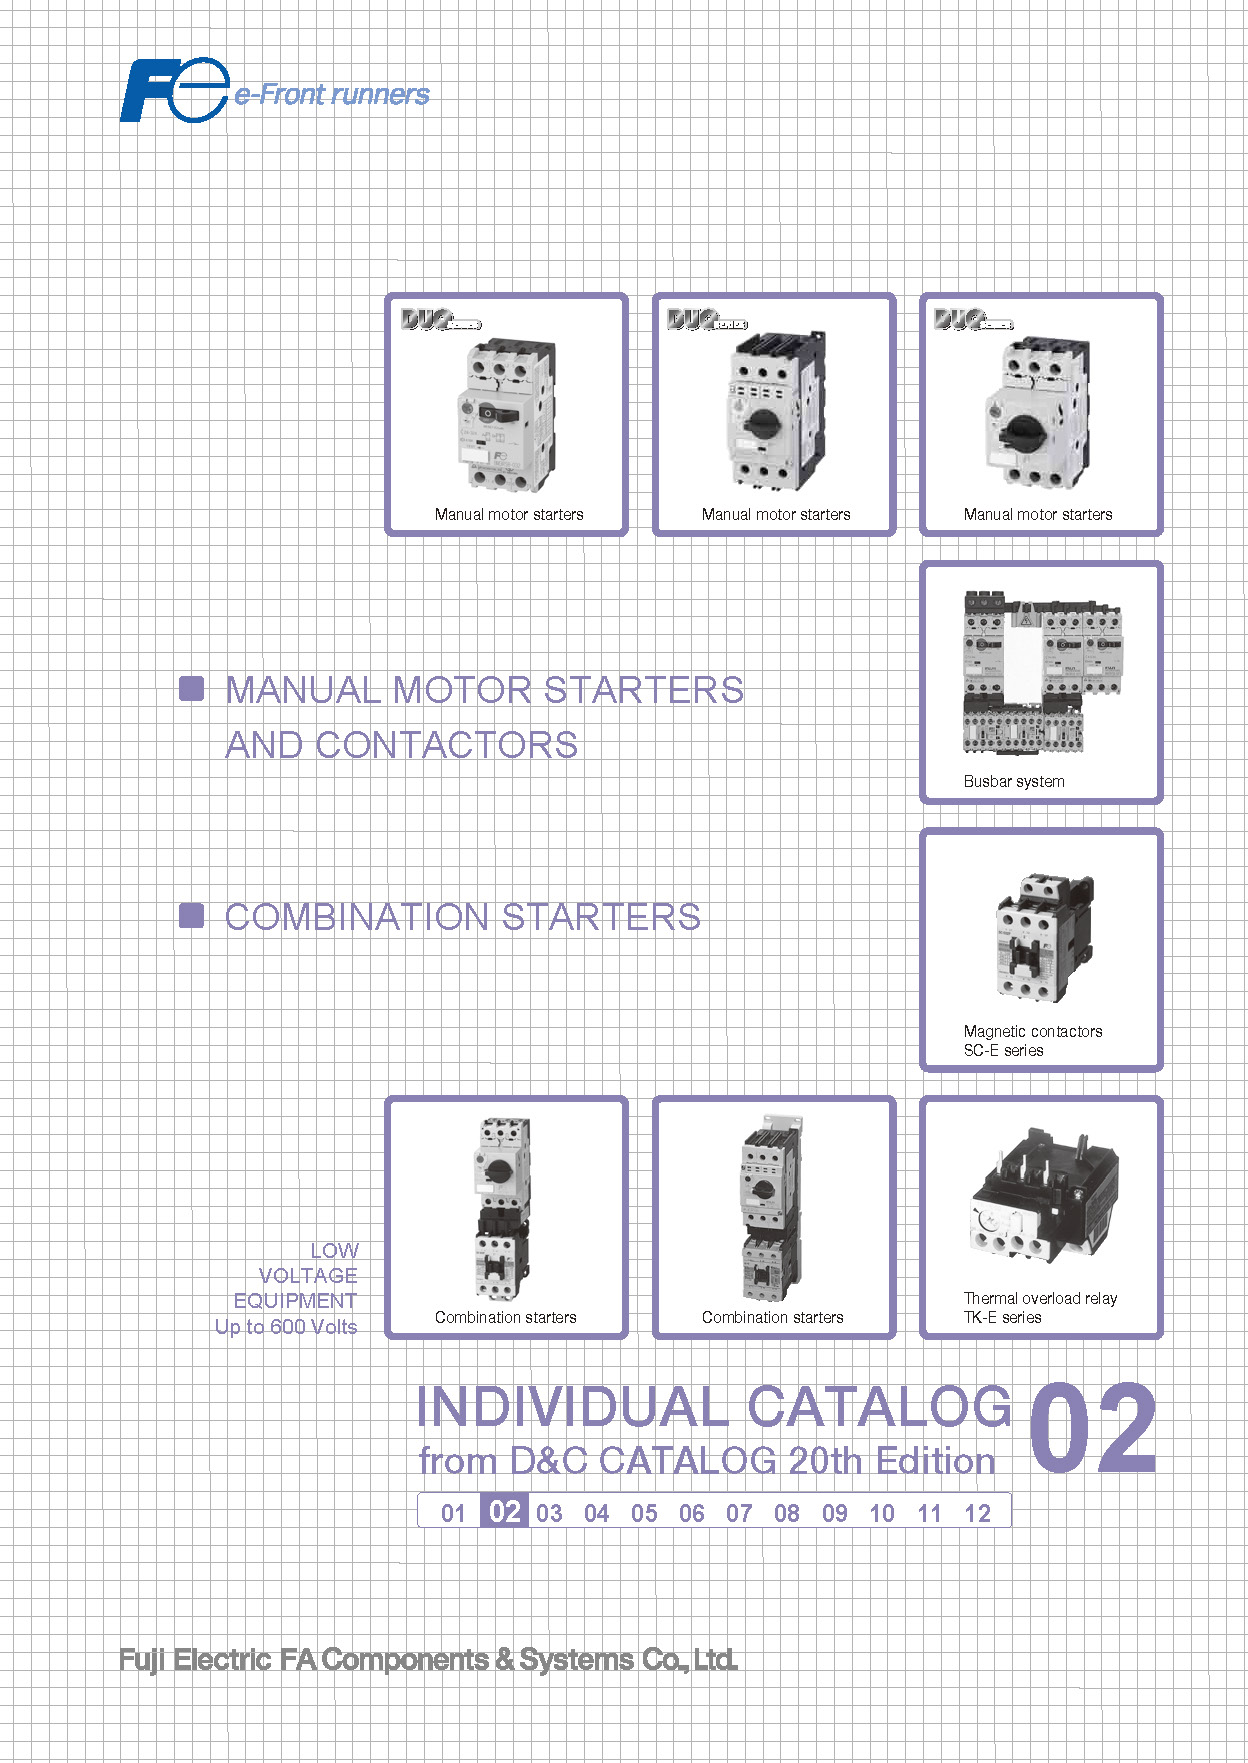 DISTRIBUTION&CONTROL CATALOG Degest 20th Edition